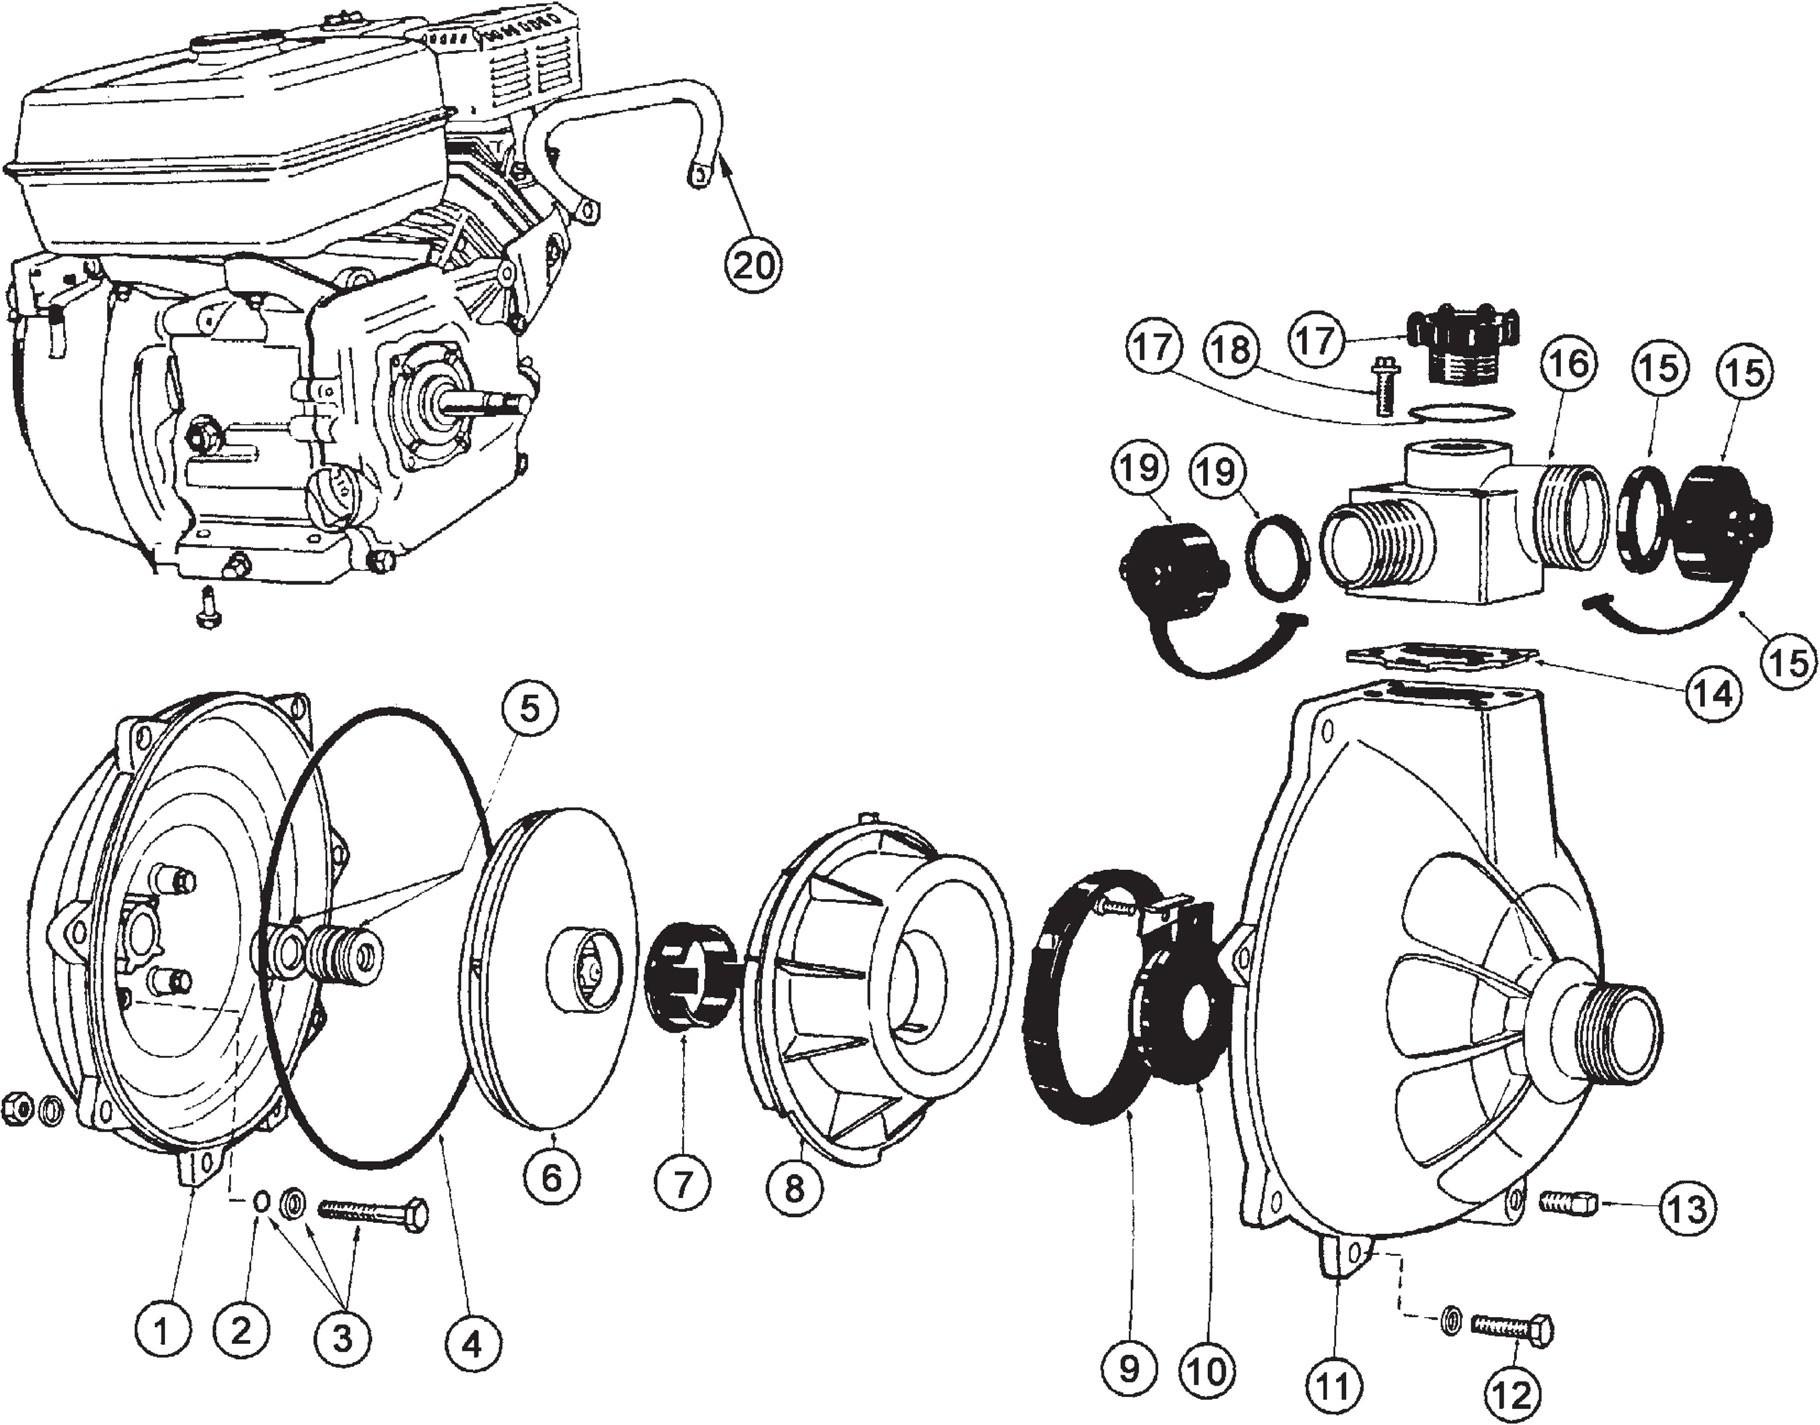 Honda Gc160 Pump Parts Diagram • Wiring Diagram For Free